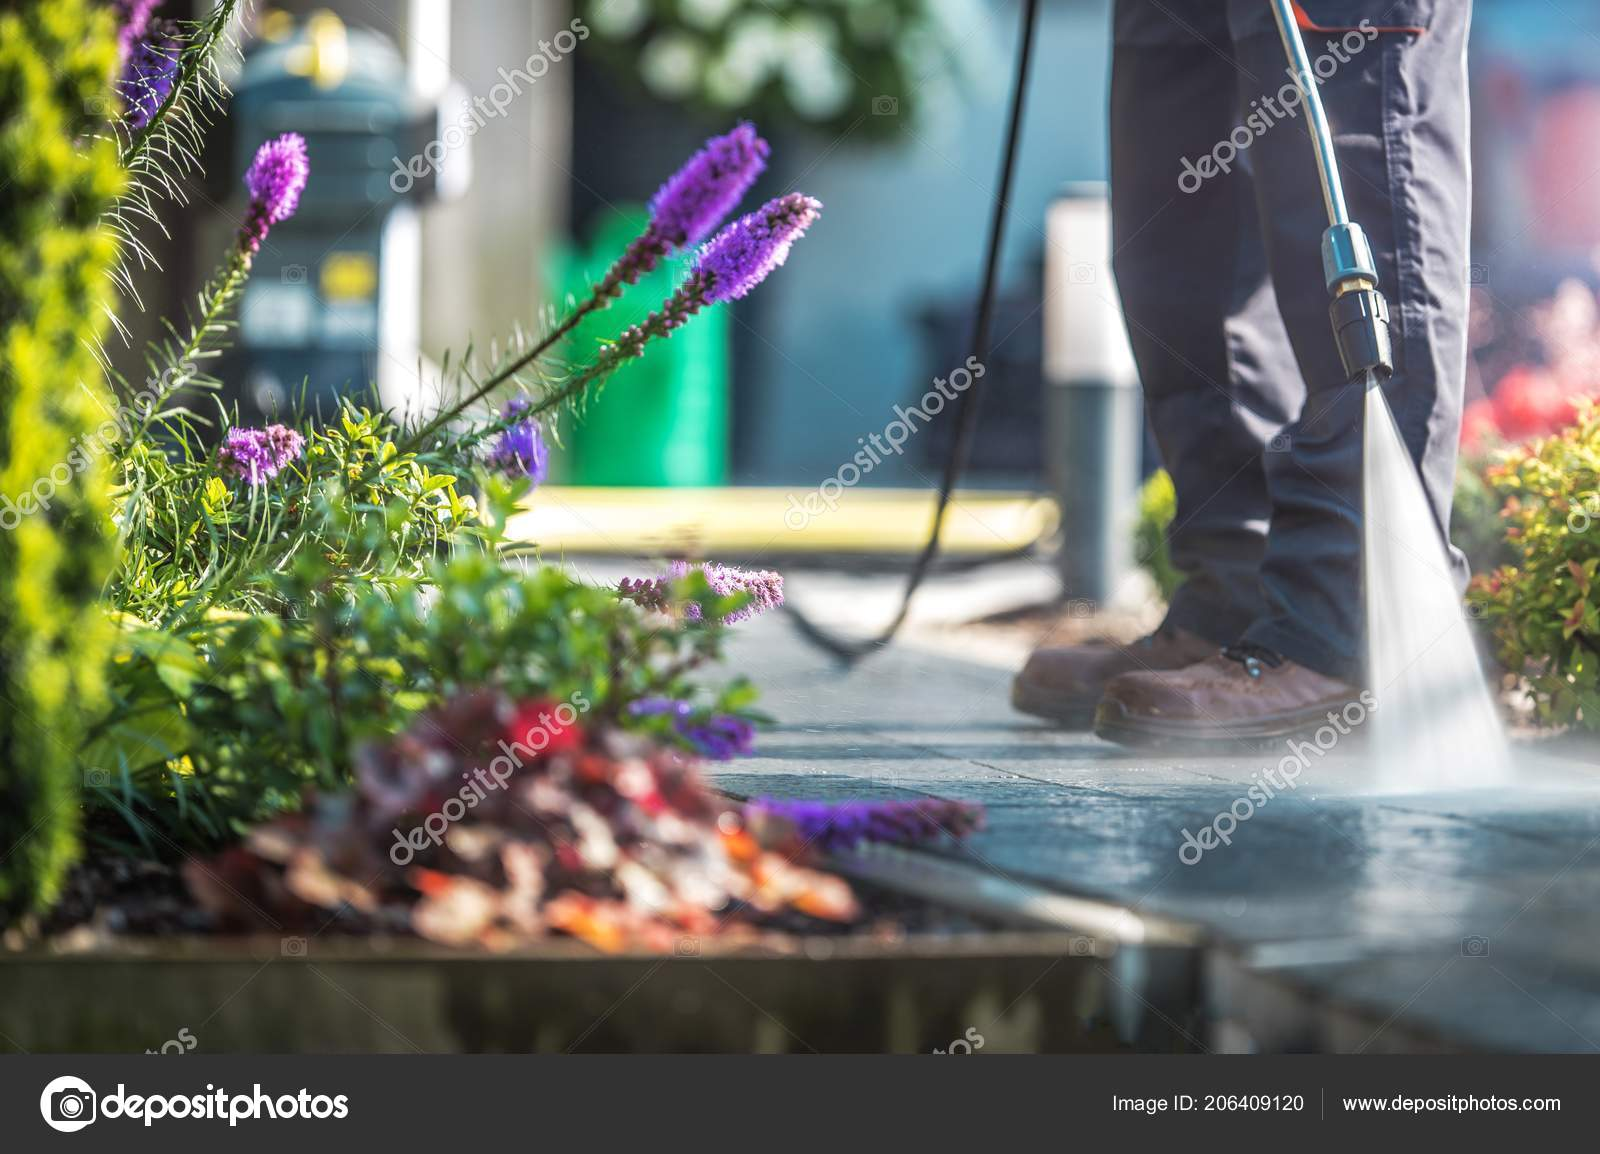 Backyard Cleaning backyard garden cleaning time pressure washer men cleaning garden